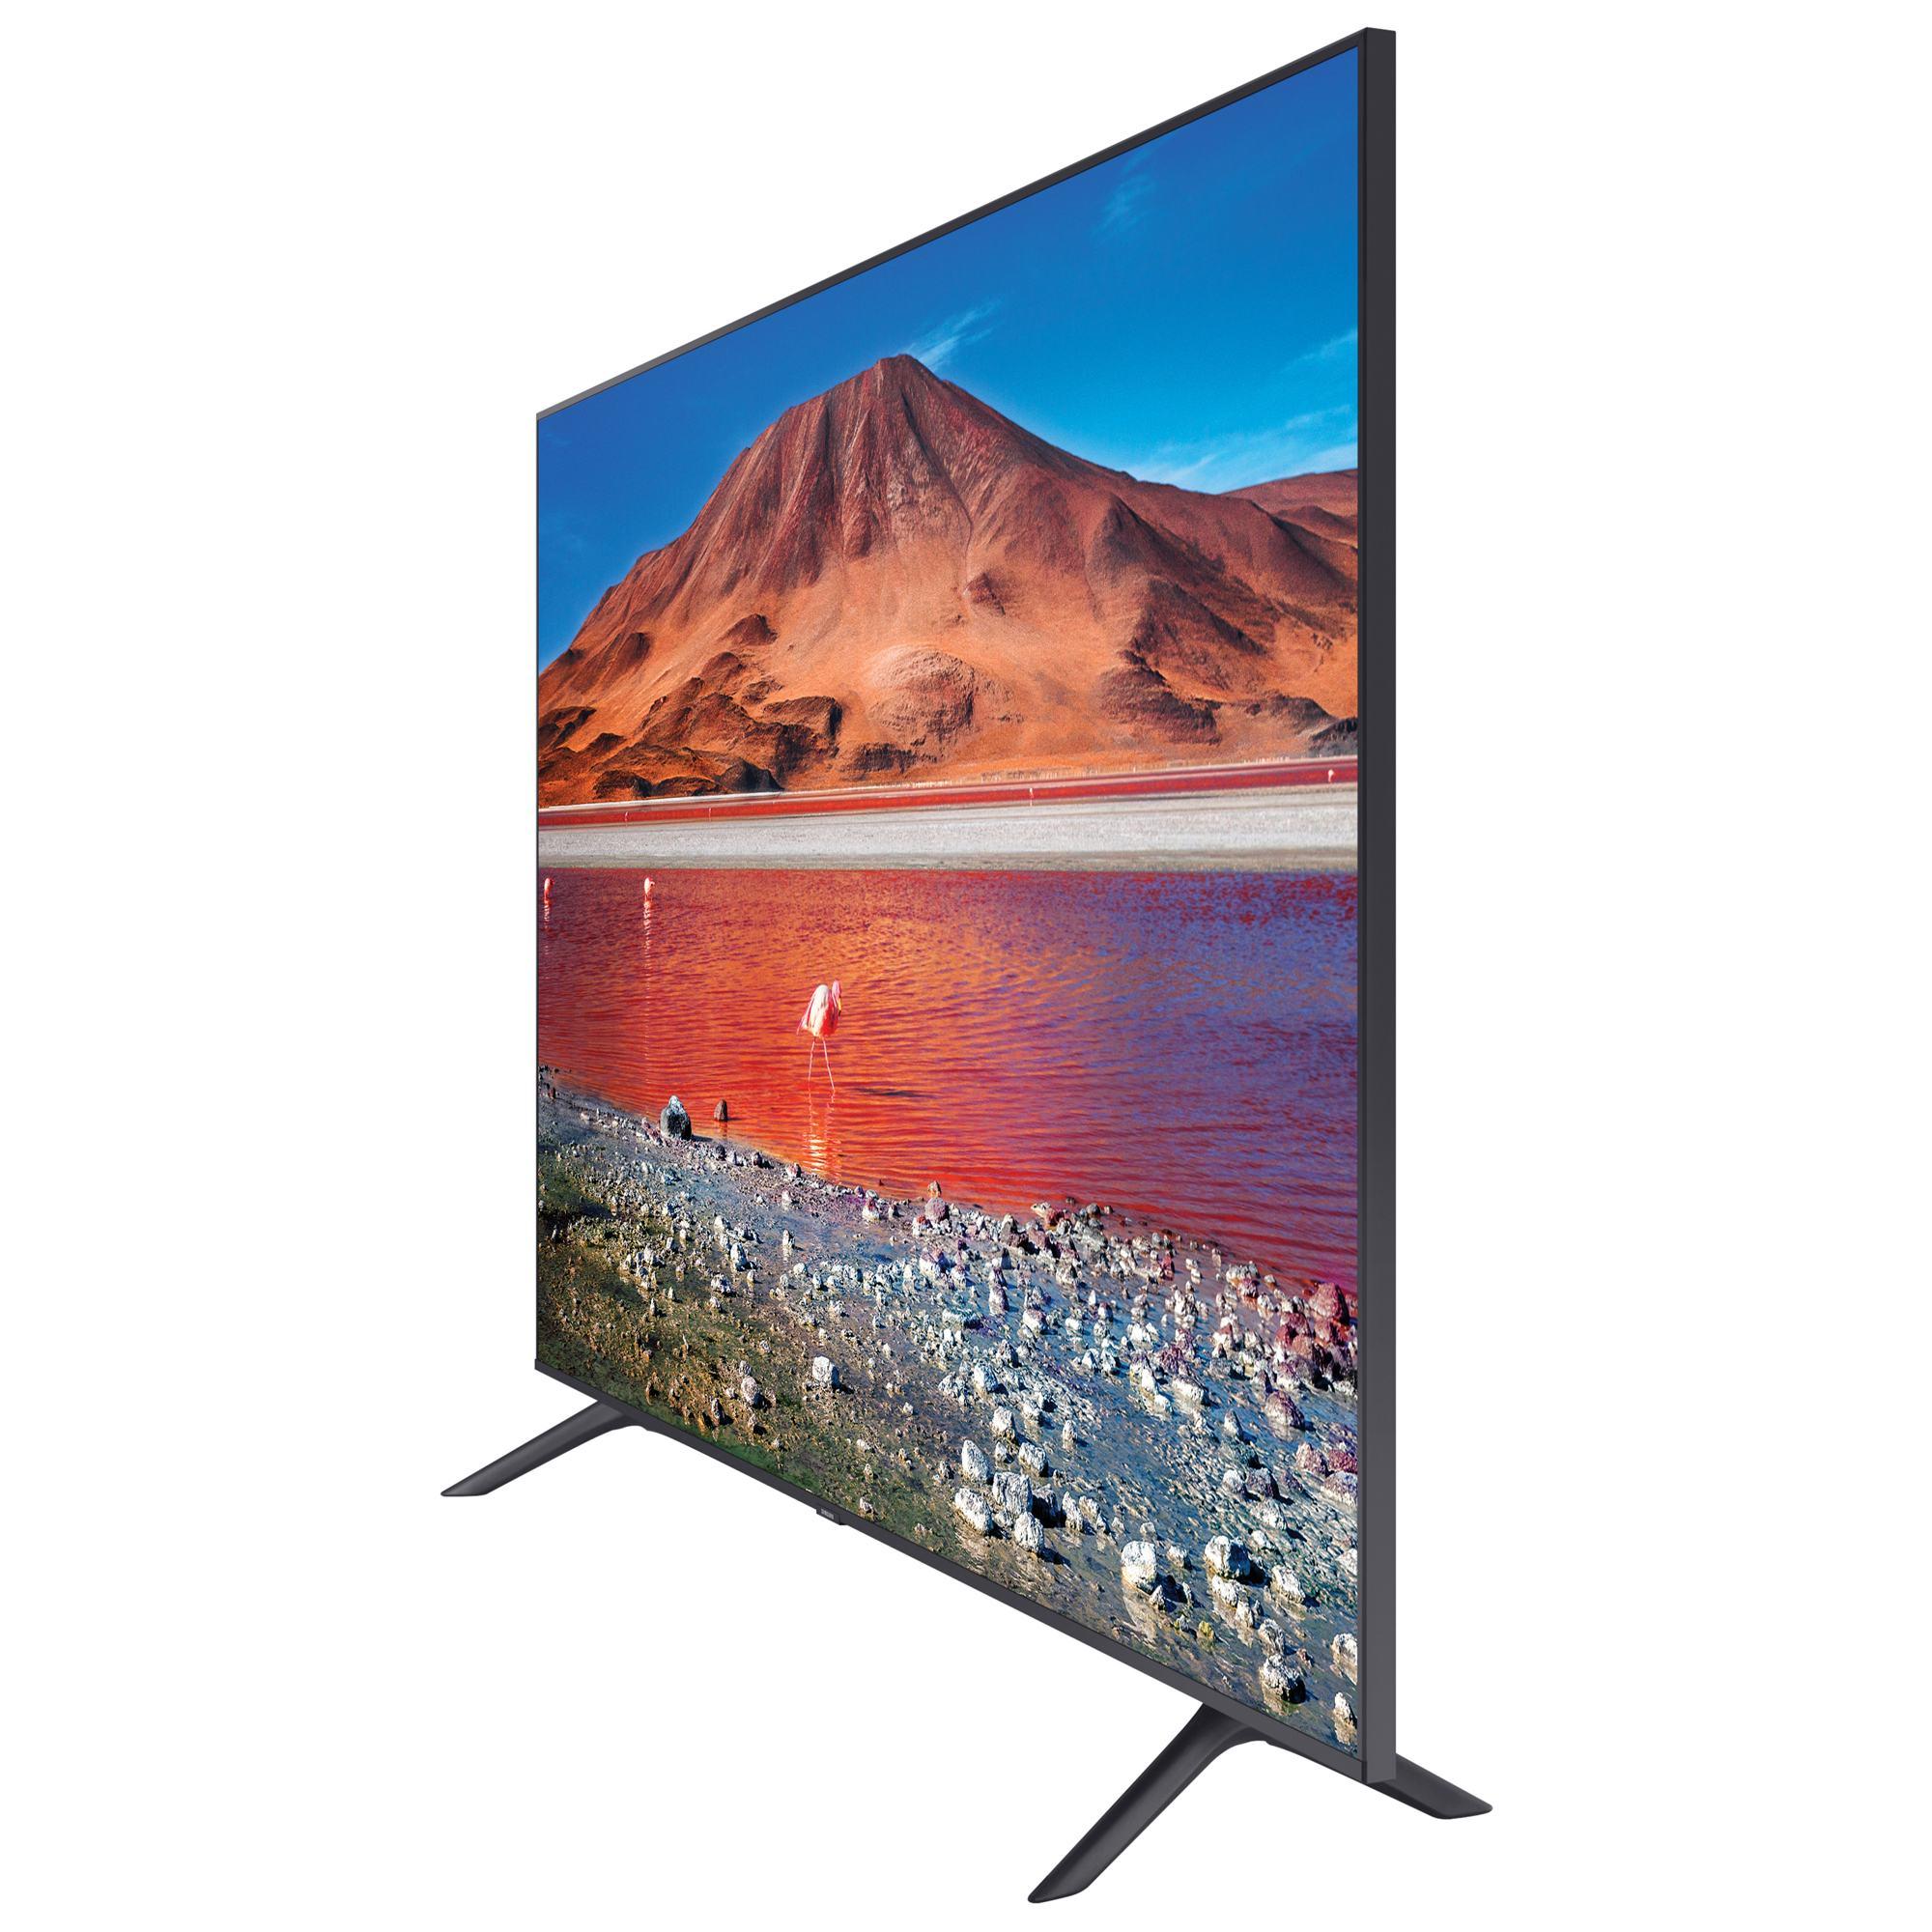 "Samsung UE75TU7100 75"" HDR Smart 4K TV with Tizen OS"